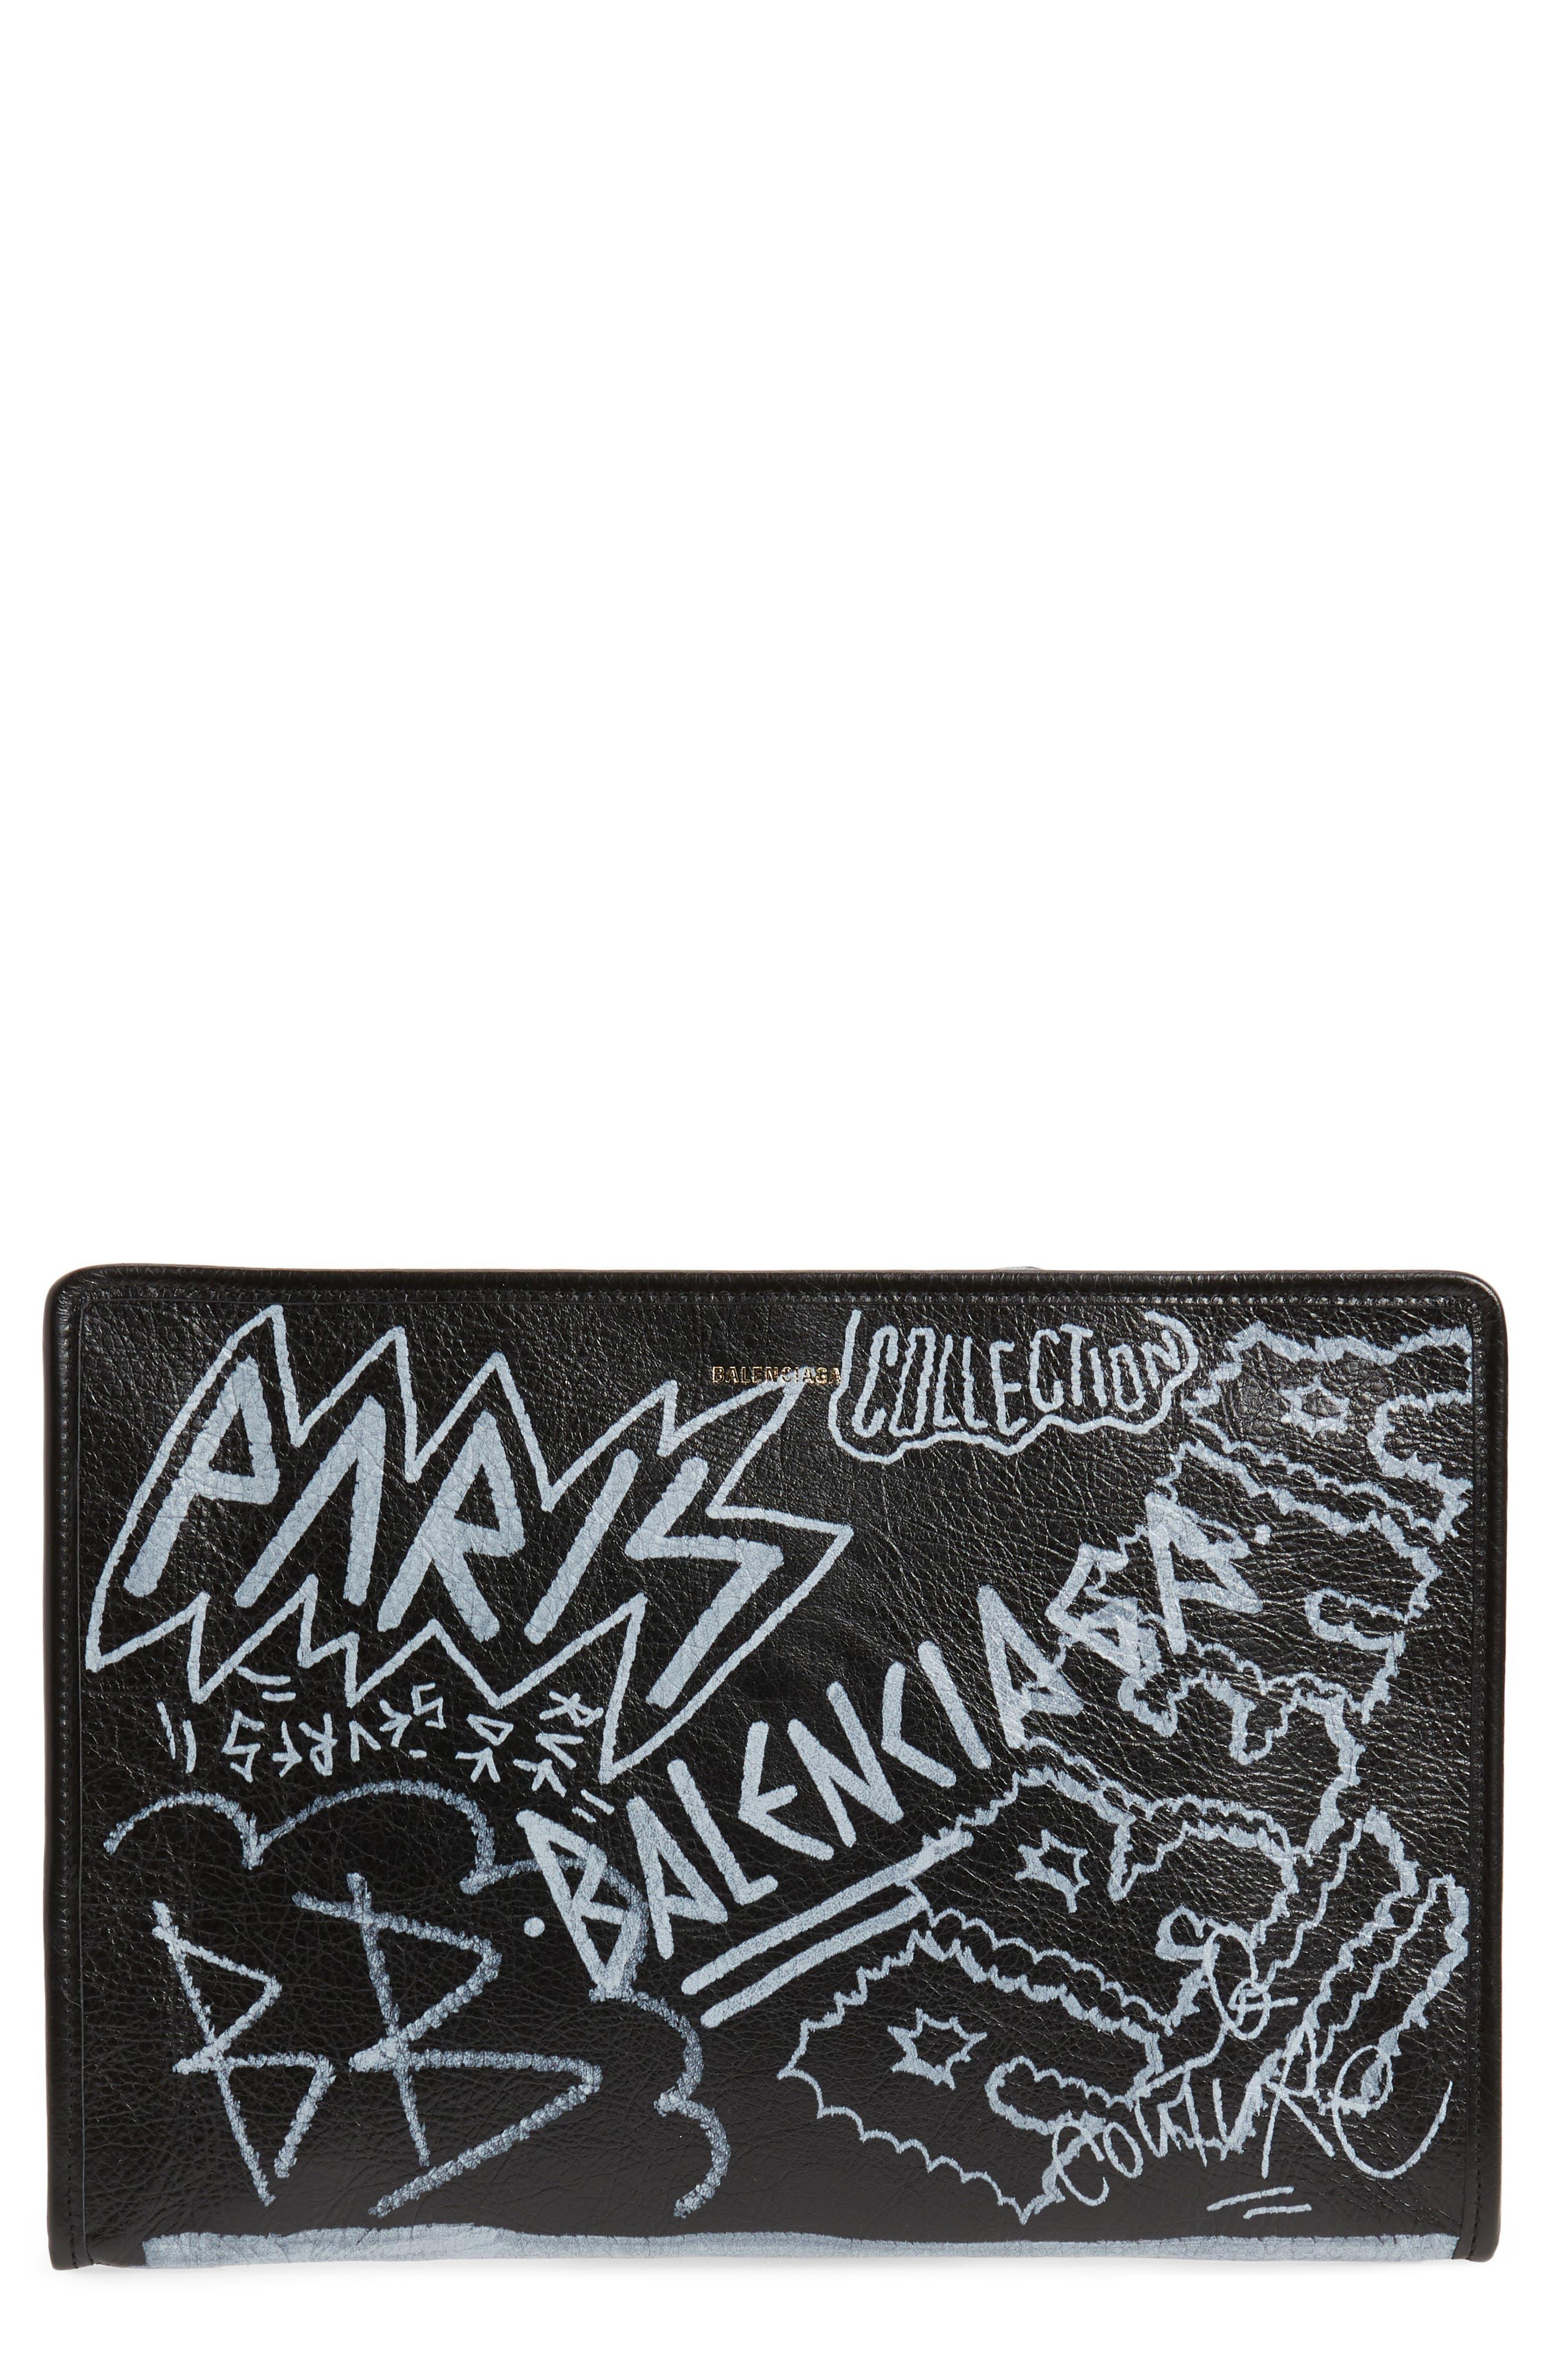 BALENCIAGA,                             Graffiti Embellished Lambskin Pouch,                             Main thumbnail 1, color,                             NOIR/ BLANC